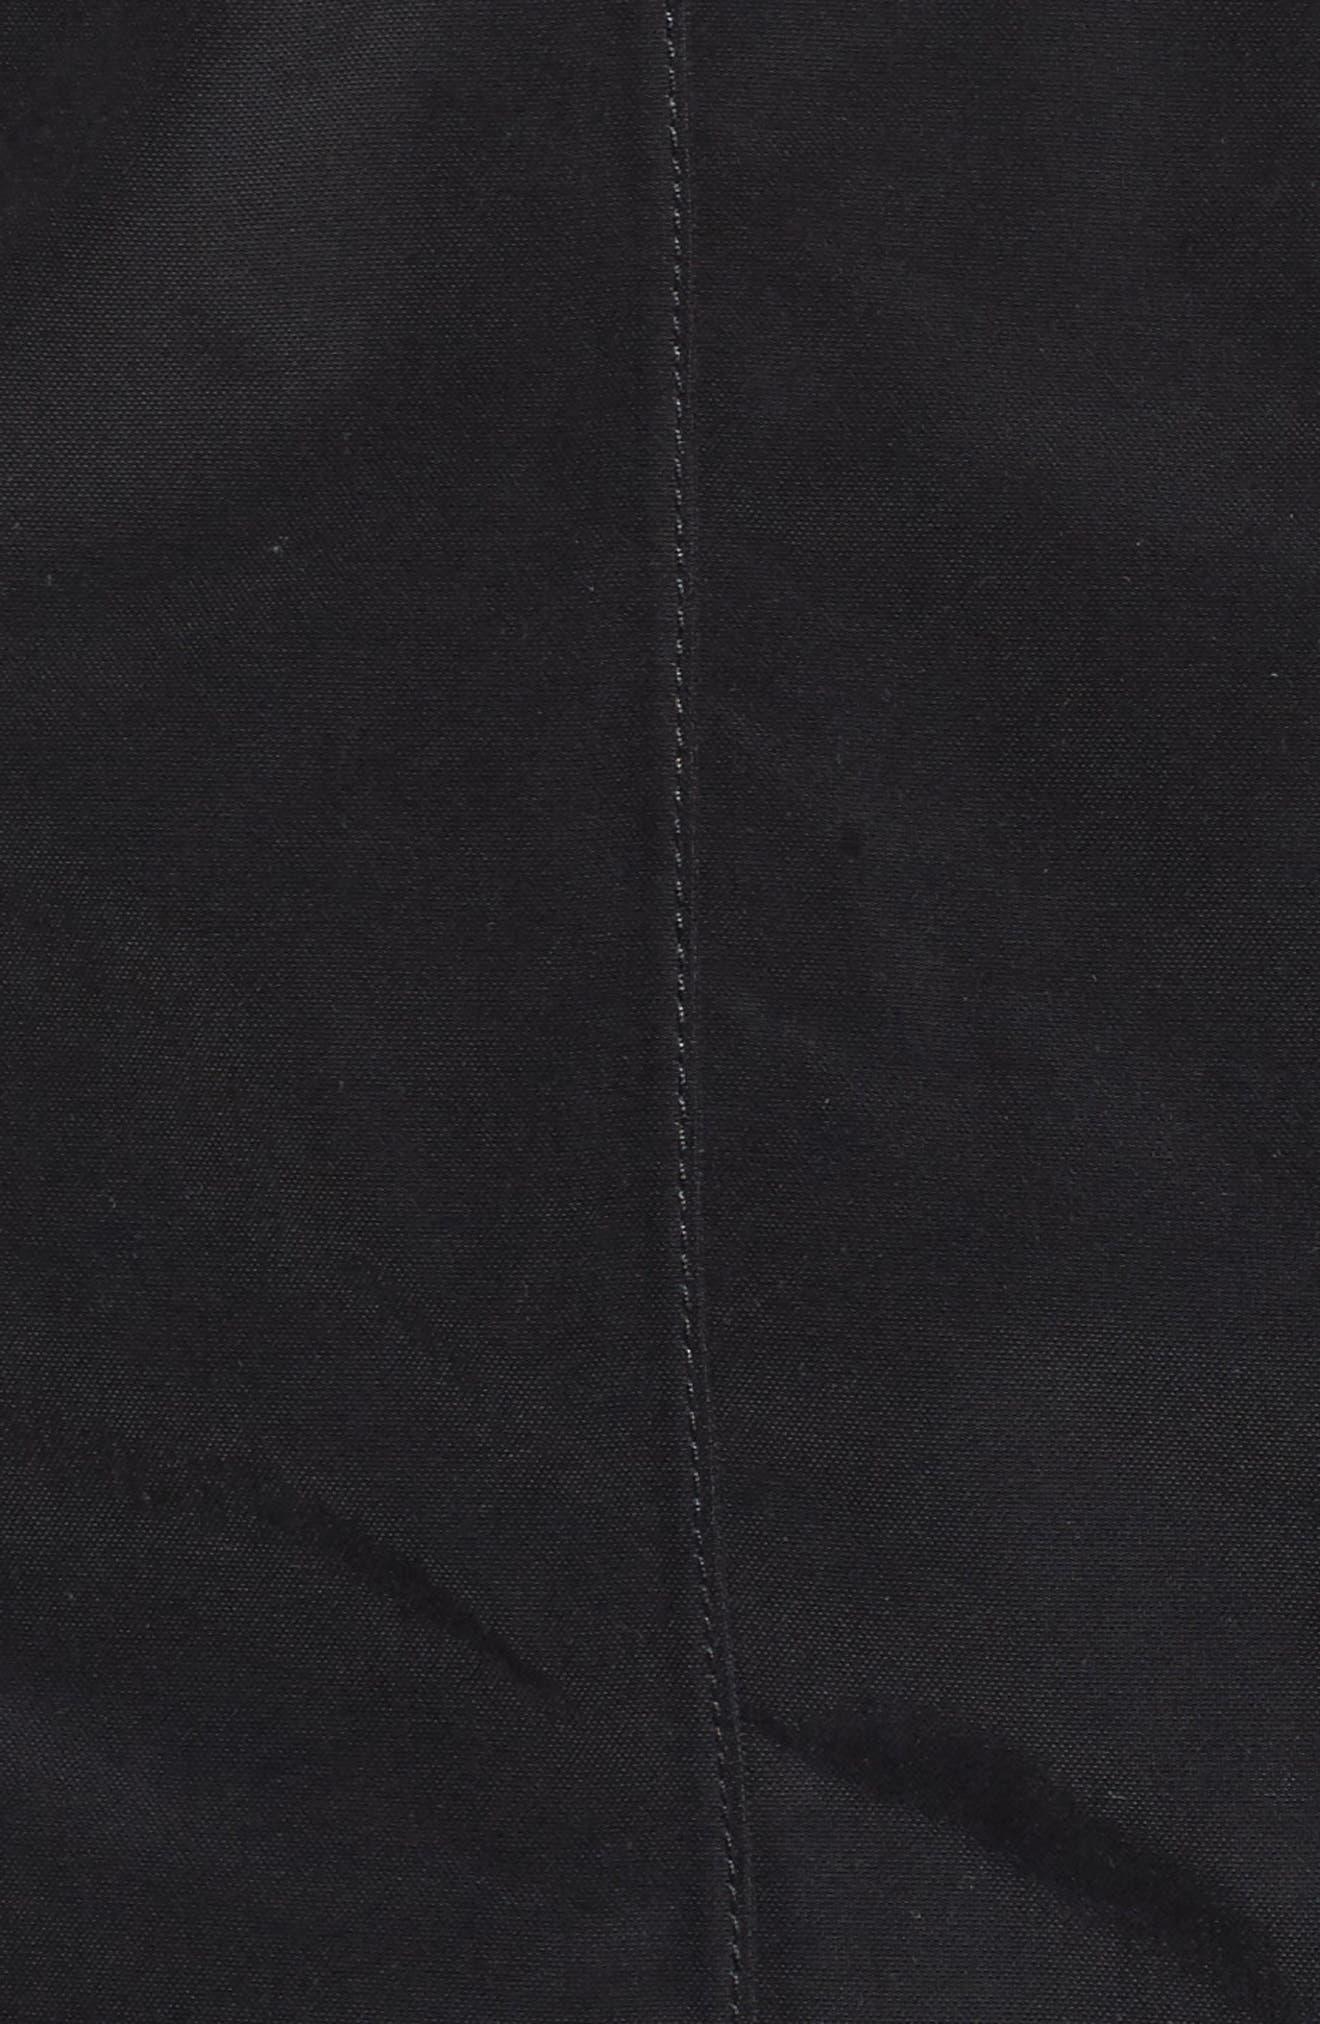 Laney II Trench Raincoat,                             Alternate thumbnail 6, color,                             Tnf Black